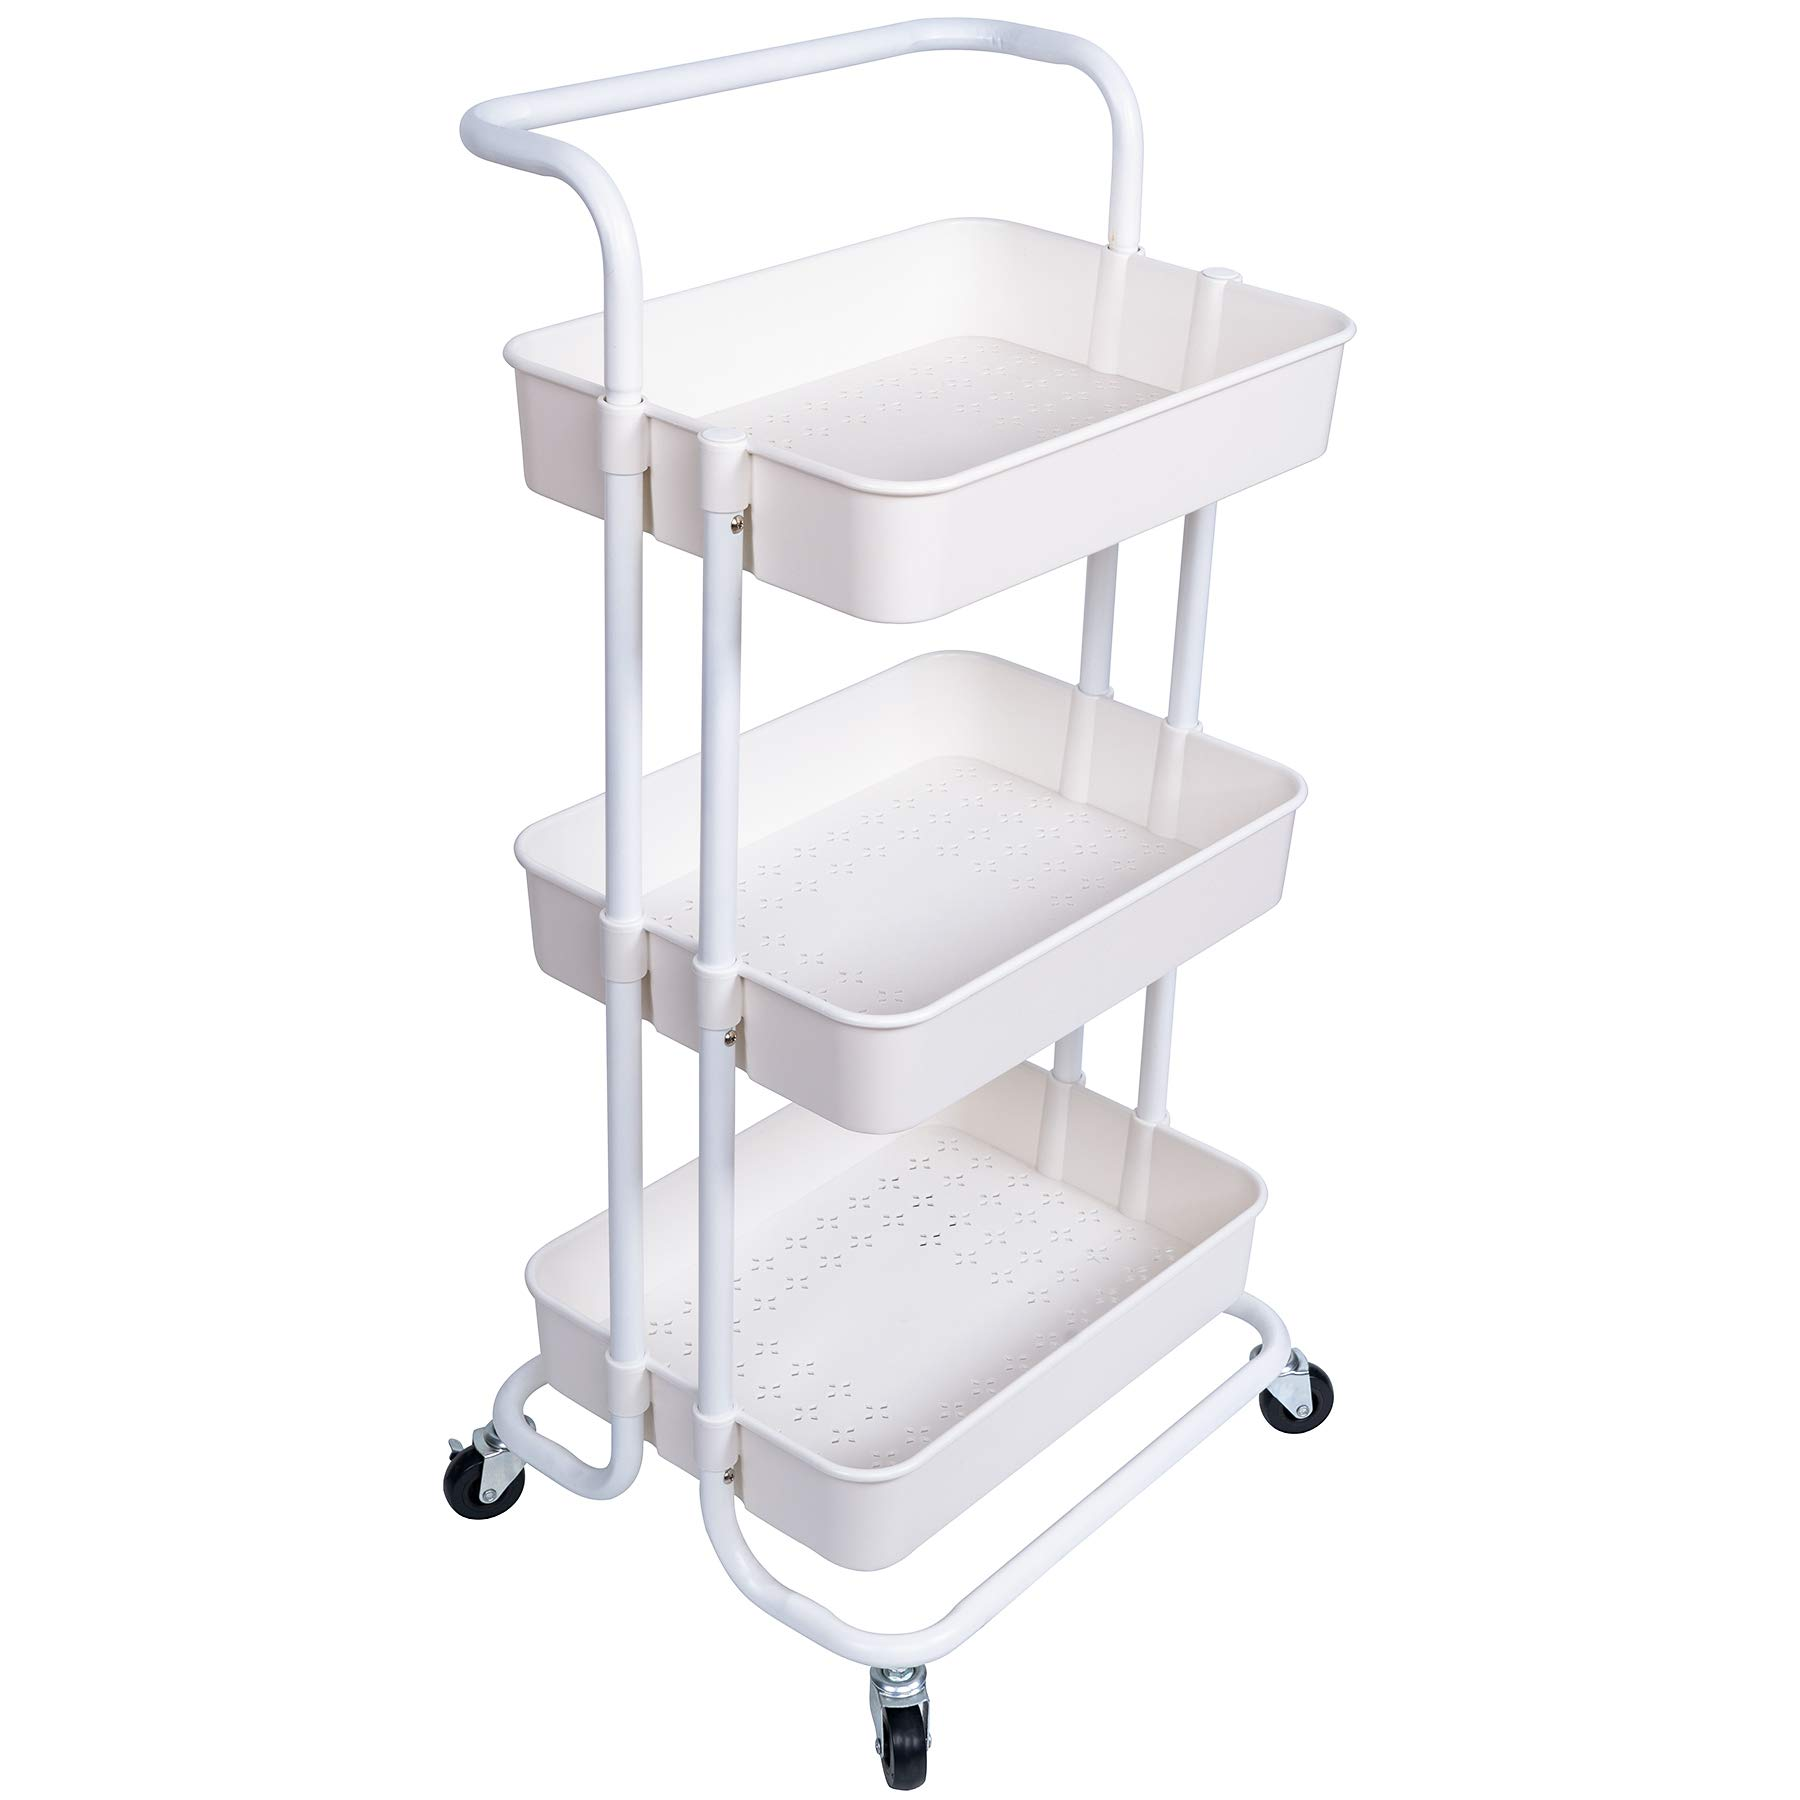 NiDream Bedding 3-Tier Rolling Utility Cart, Storage Trolley Cart, Heavy Duty Mobile Storage Organizer with Handles and Lockable Wheels, Bathroom Storage Cart with Mesh Baskets, White by NiDream Bedding